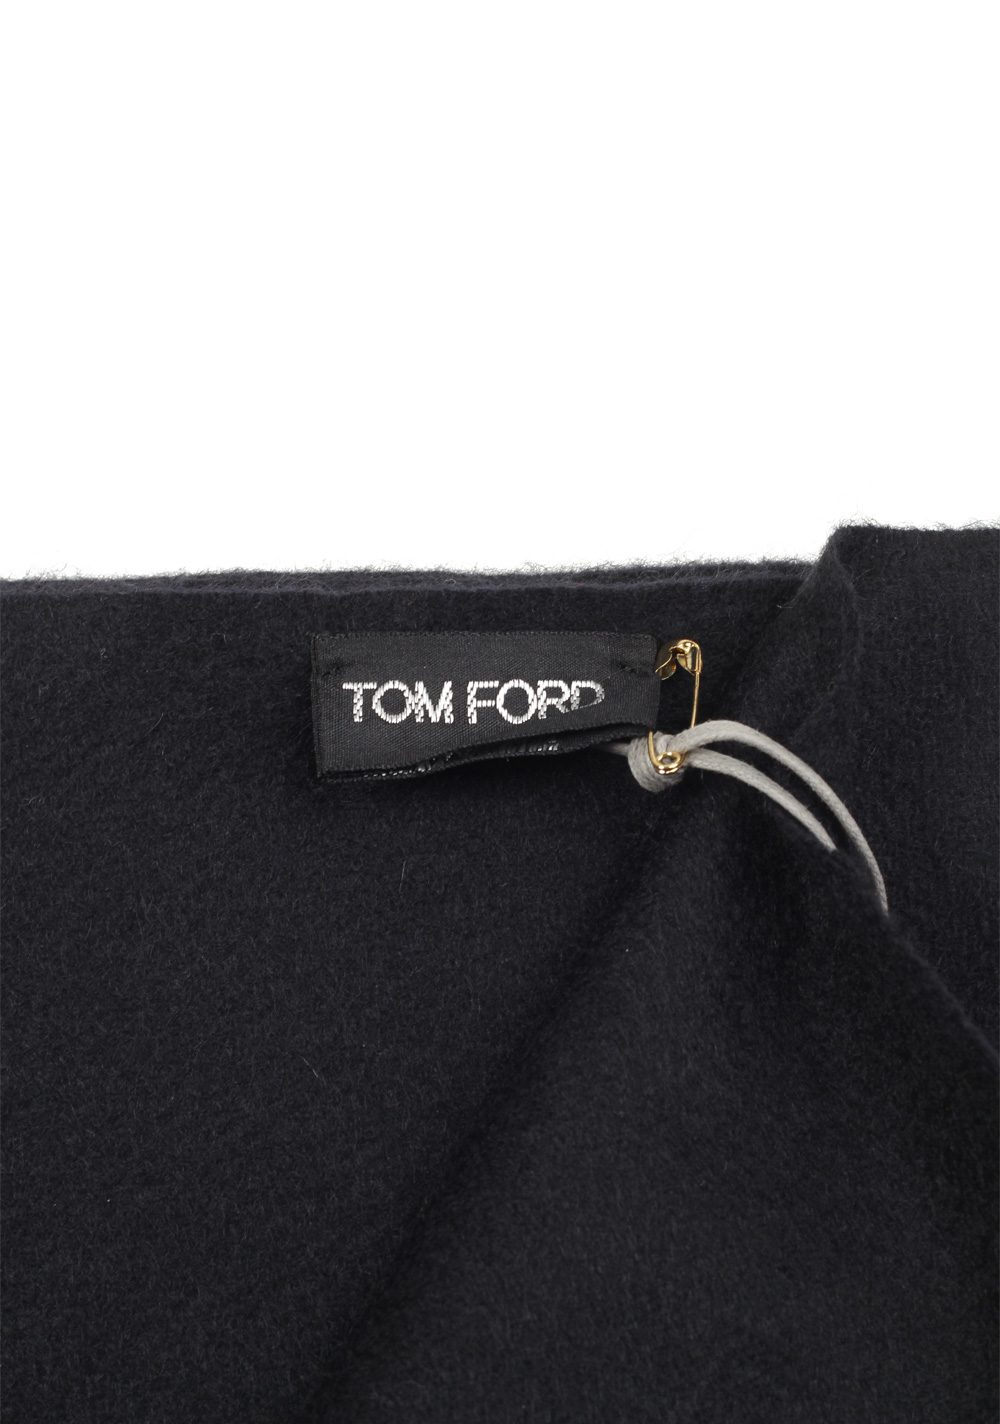 Tom Ford Black Cashmere Signature Scarf 60″ / 14″   Costume Limité